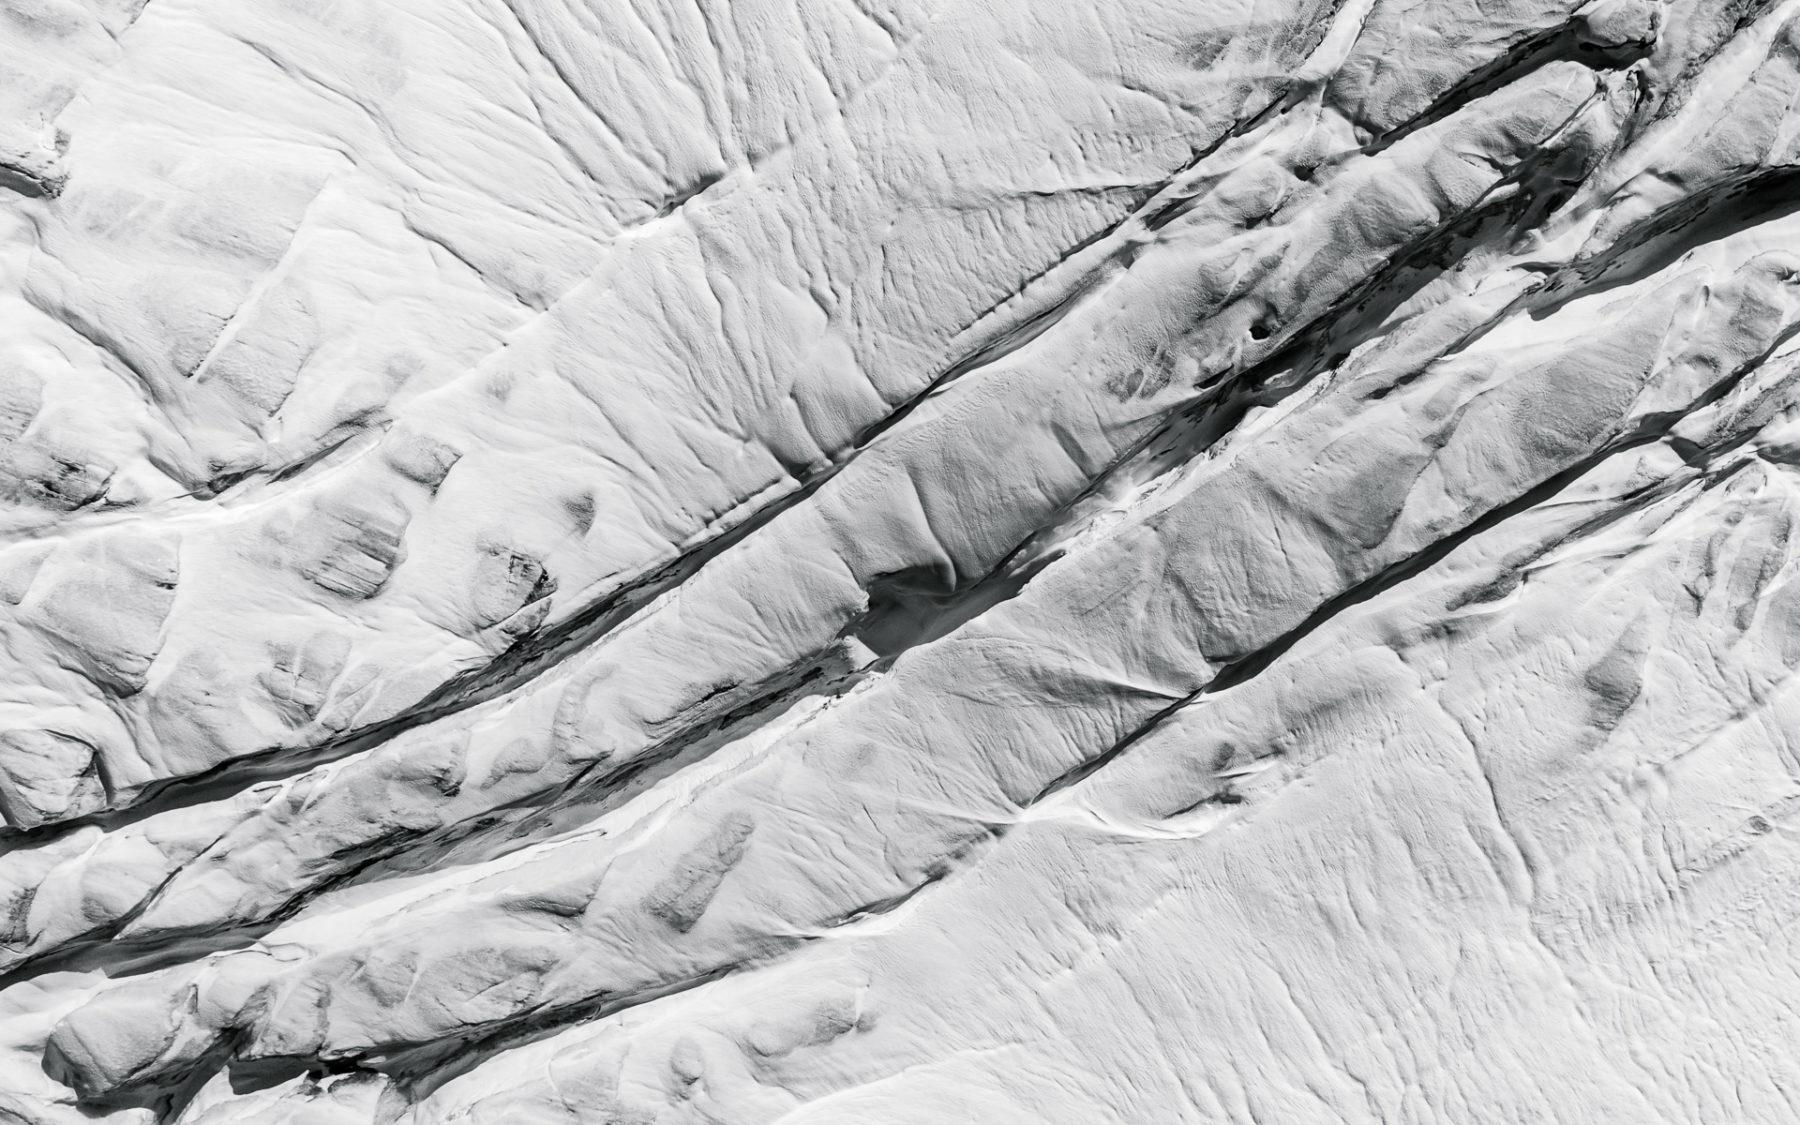 nls 2001 norway iceland portraits of glaciers 05